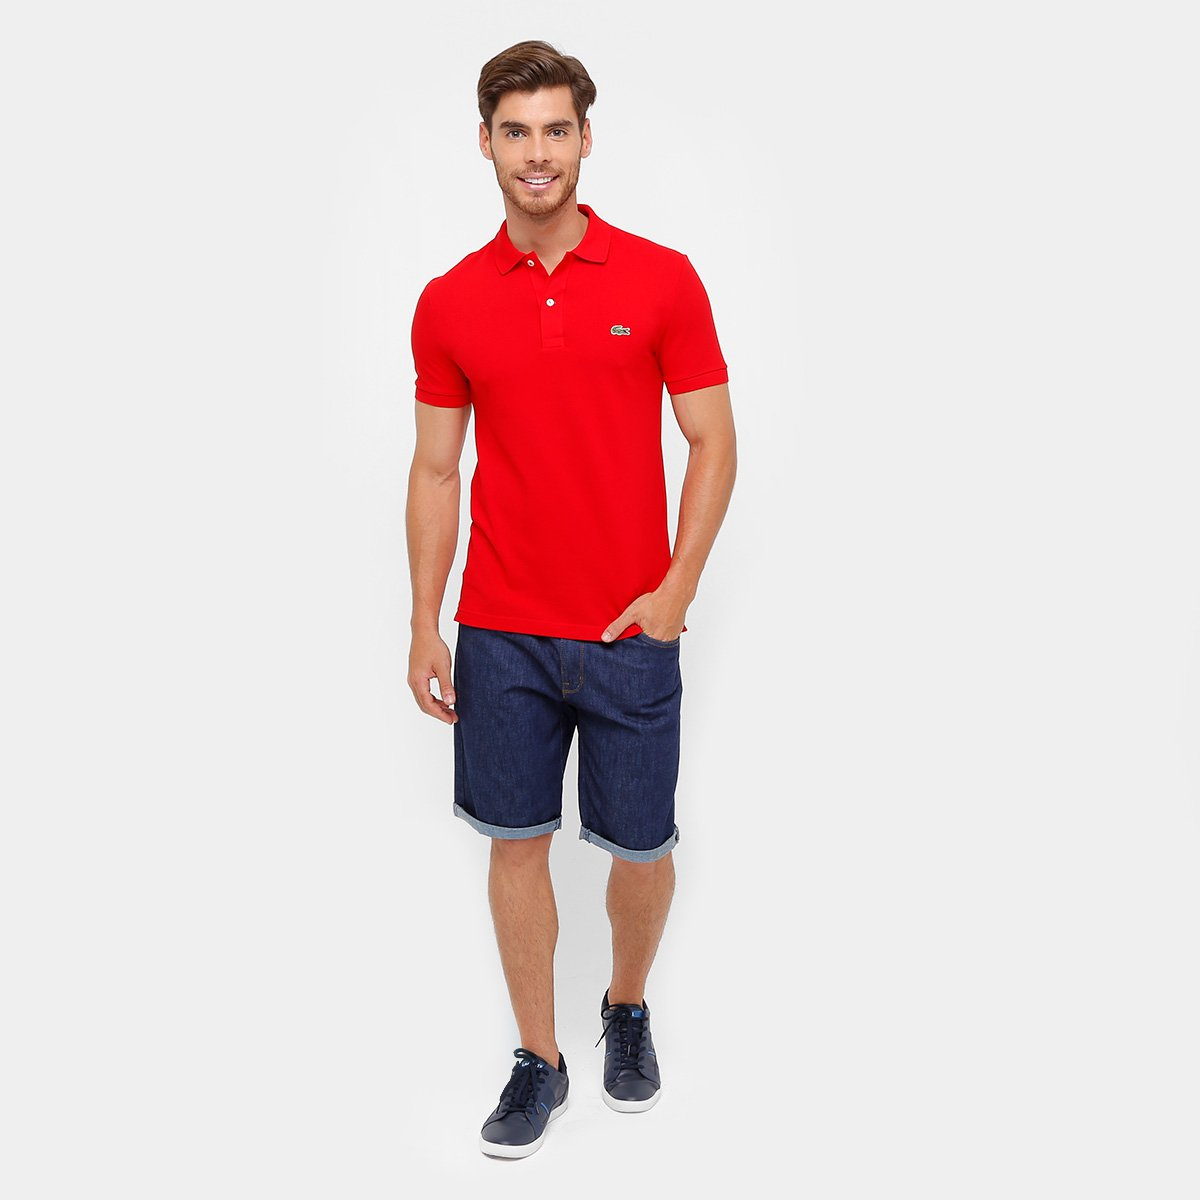 ec8d1ffdf8 Camisa Polo Lacoste Piquet Slim Fit Masculina - Compre Agora